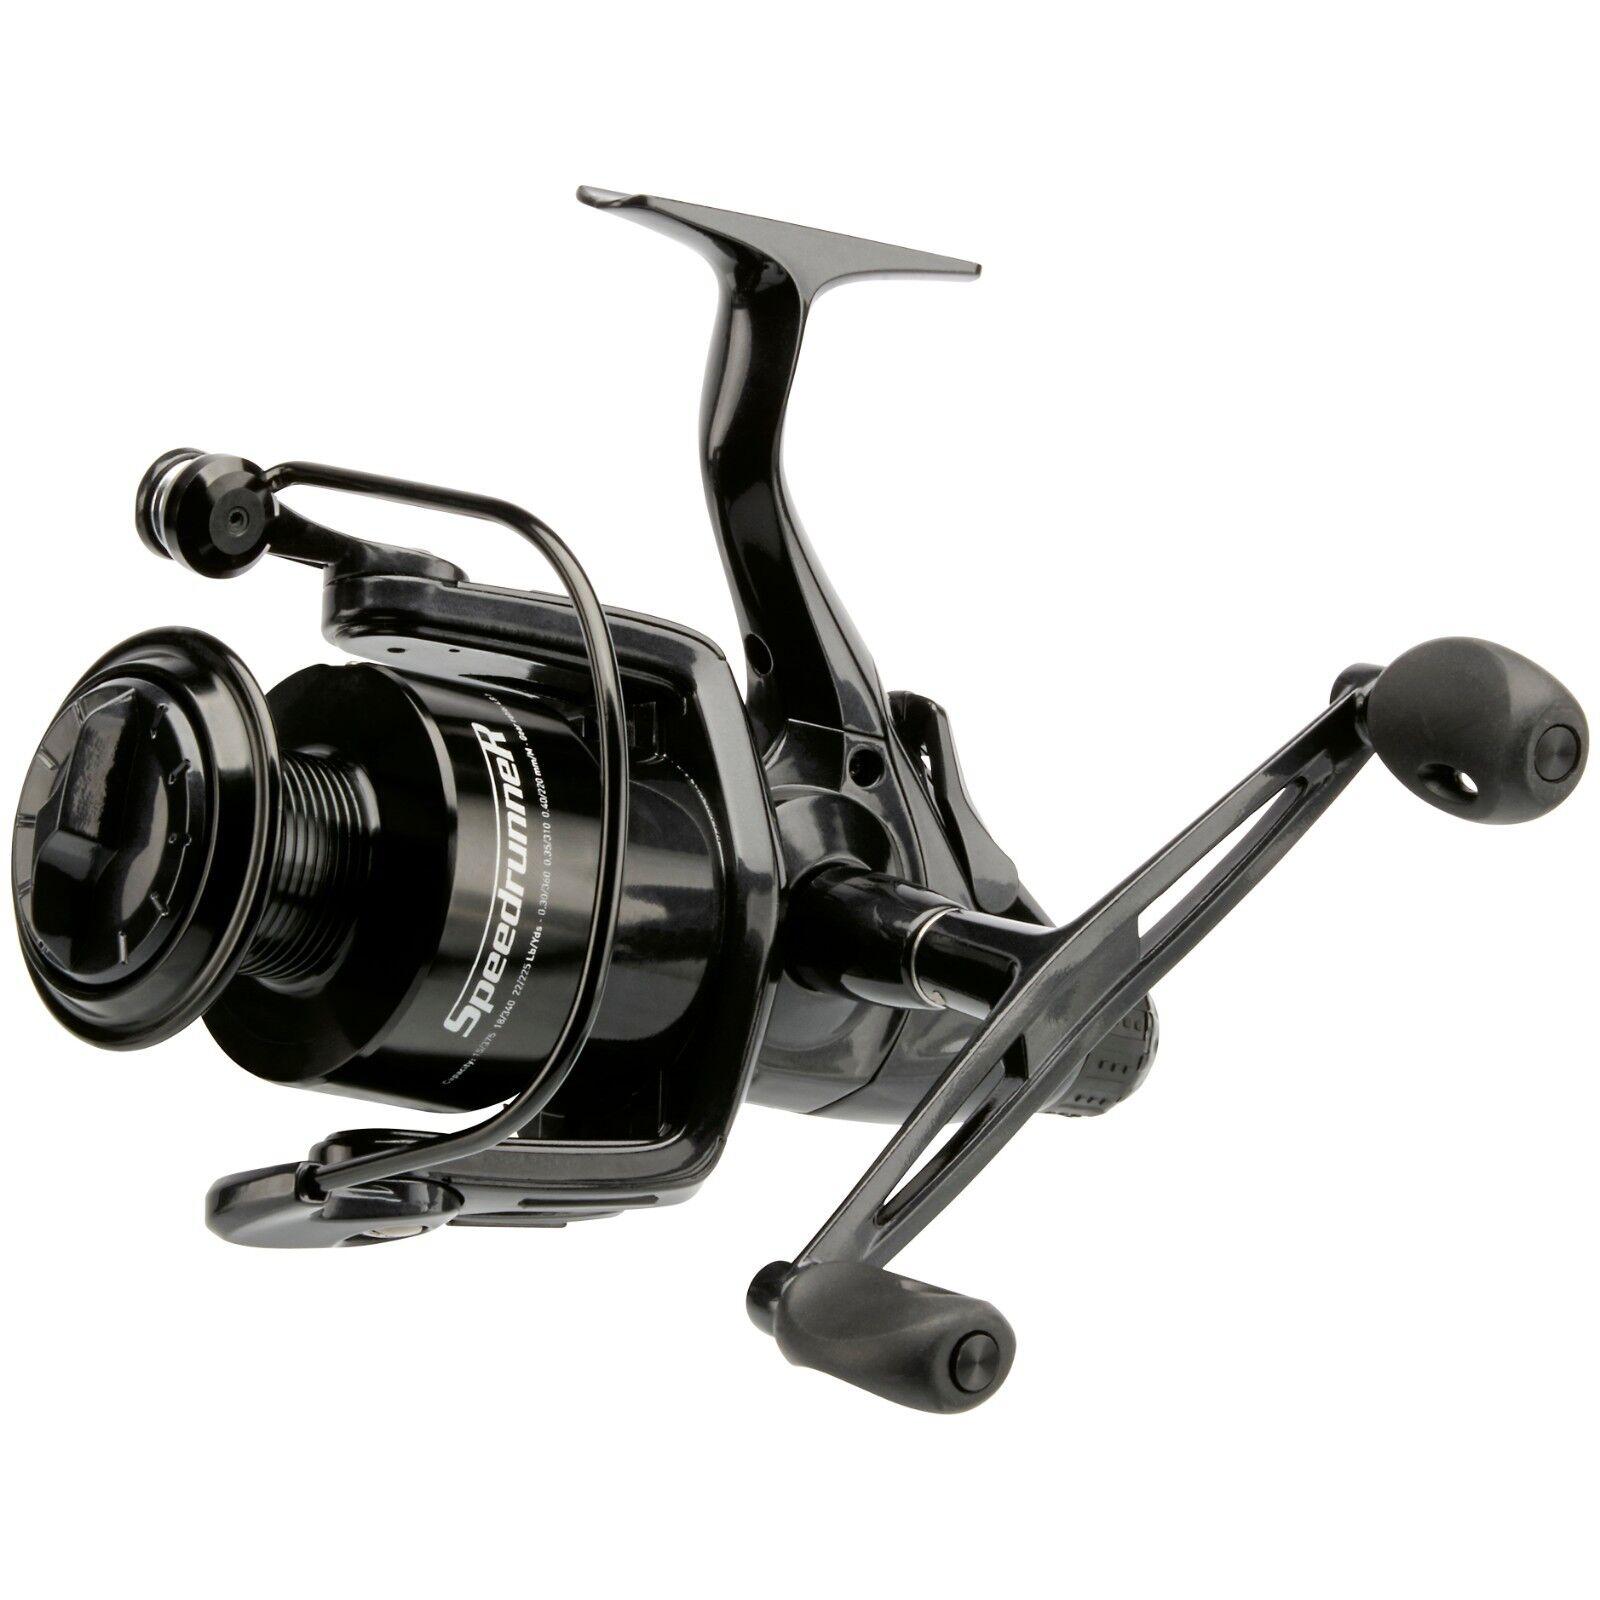 Carp Pro Speed Fishing Reel Free Spool System Double Handle